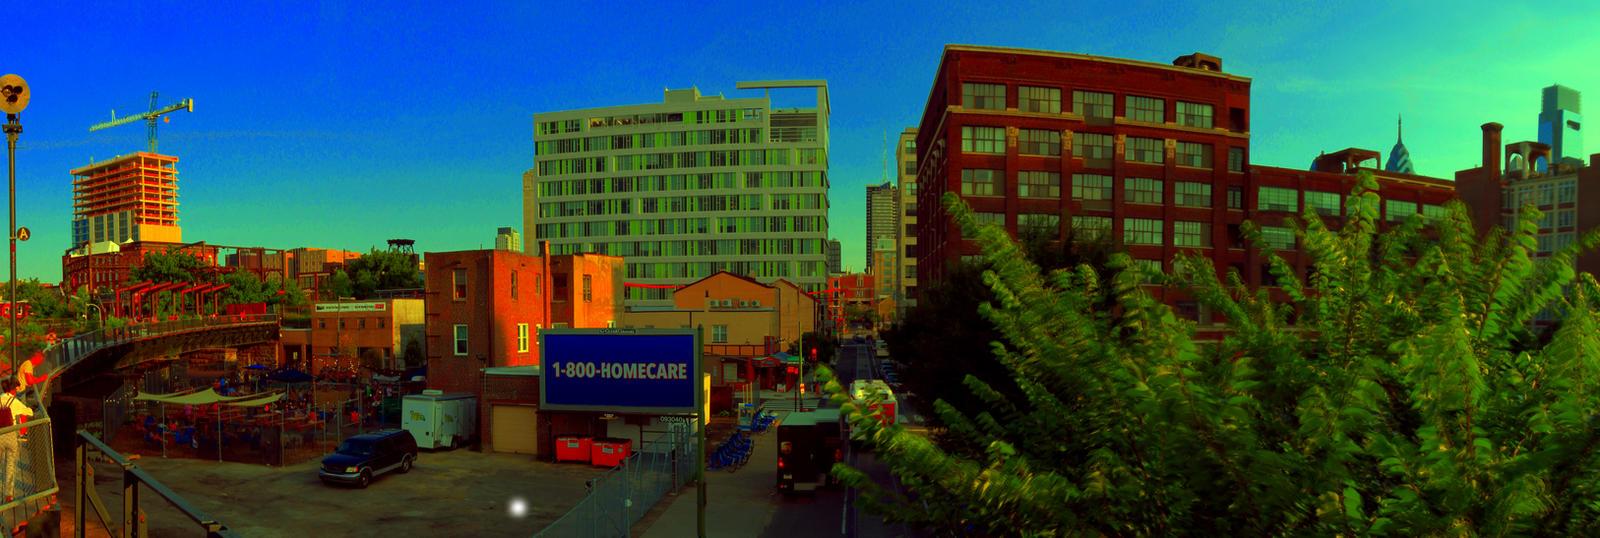 Panorama 3676 hdr pregamma 1 reinhard05 brightness by bruhinb